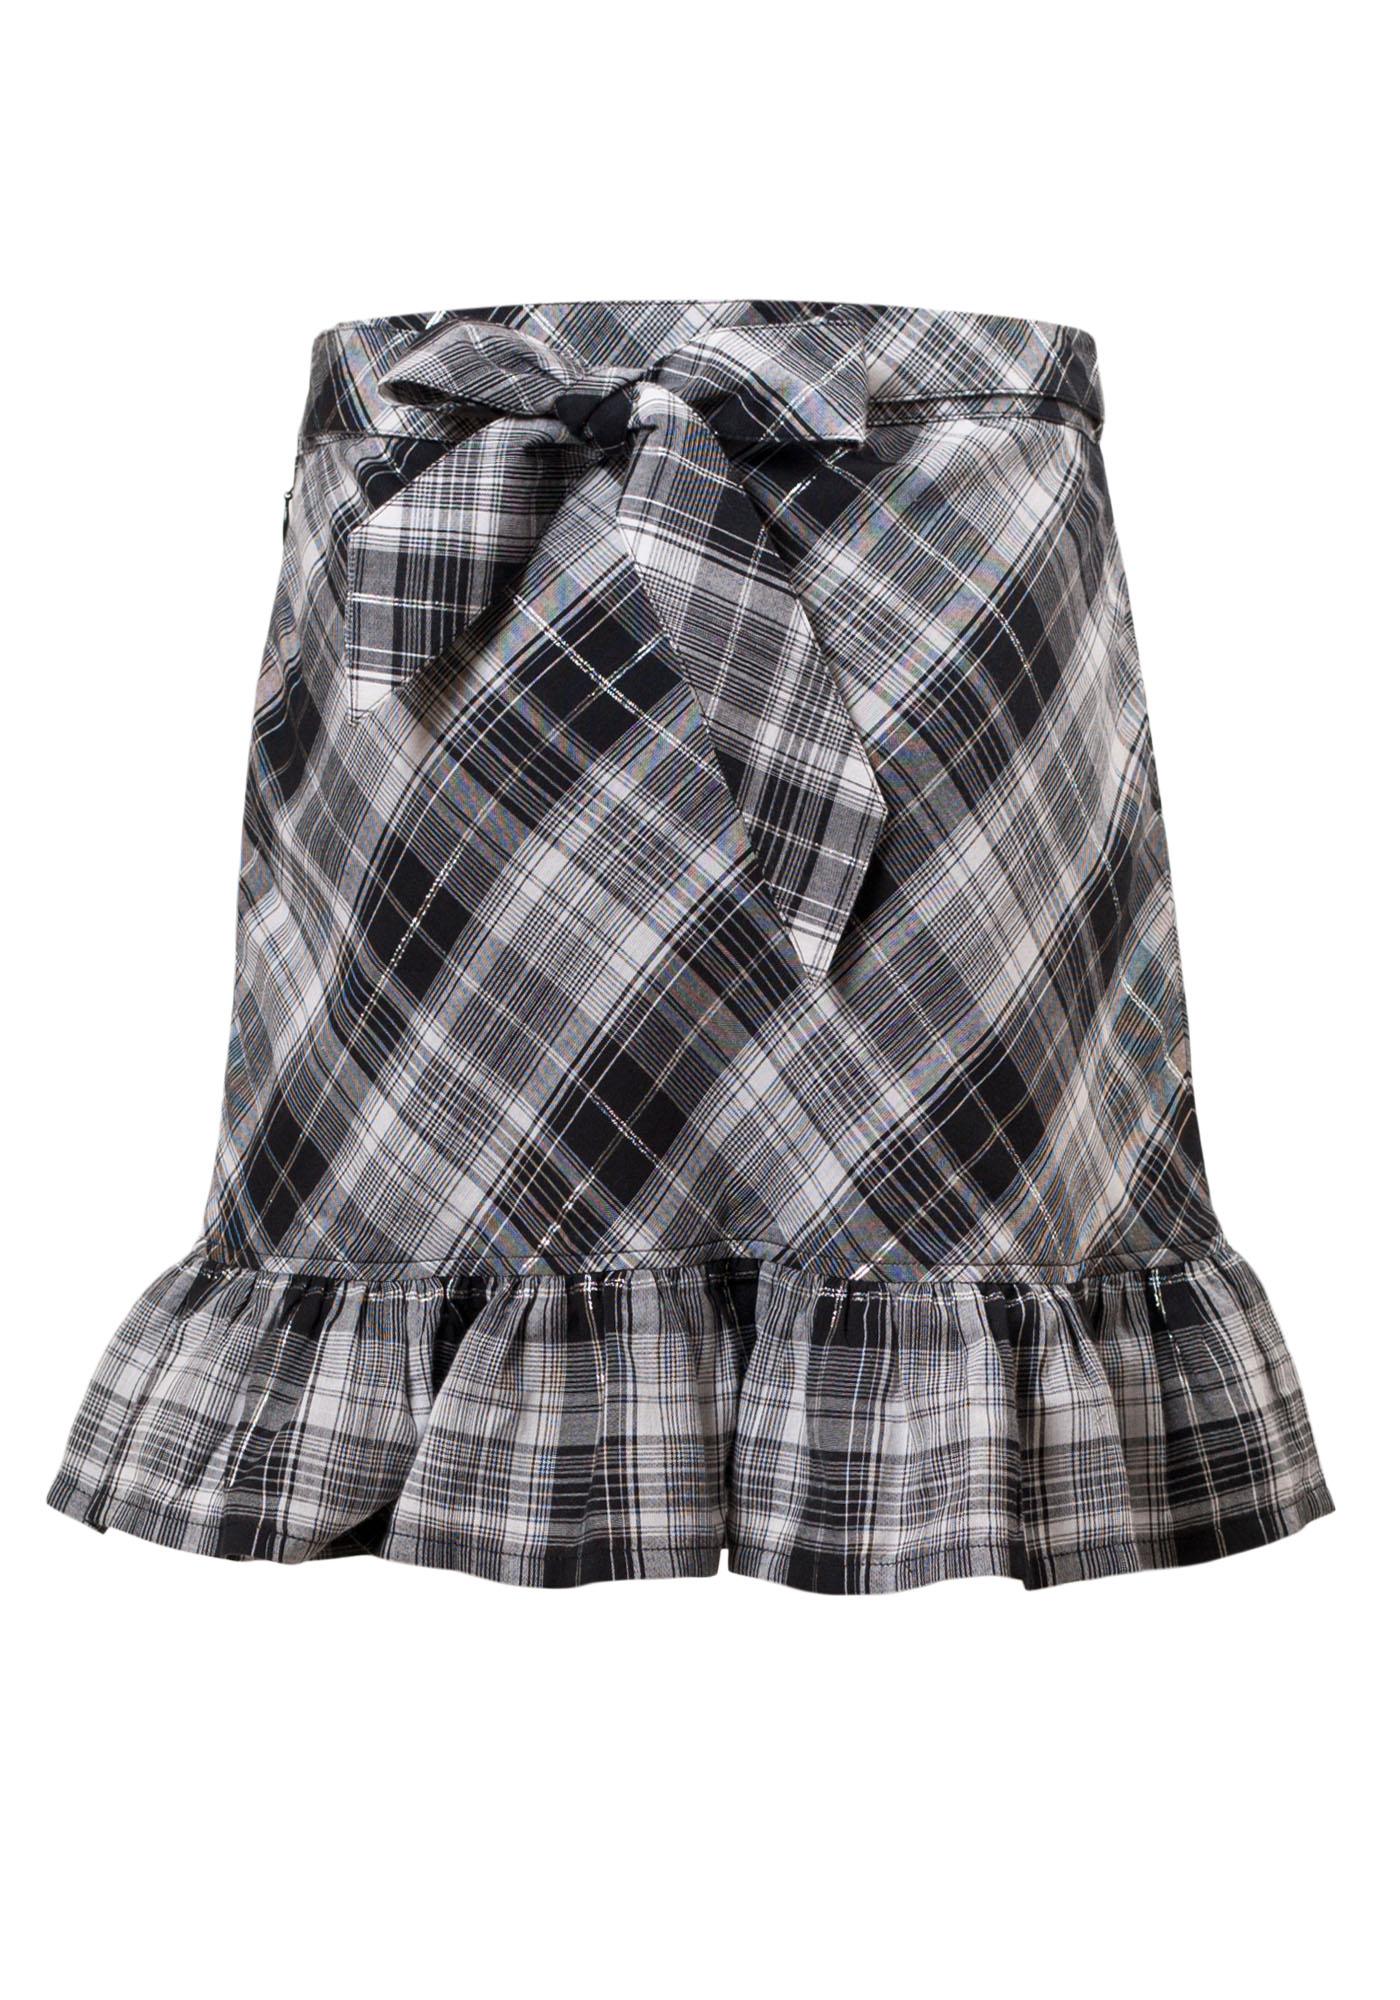 MINC Petite Elegant Girls Ruffle Skirt in Black & White Checks Cotton